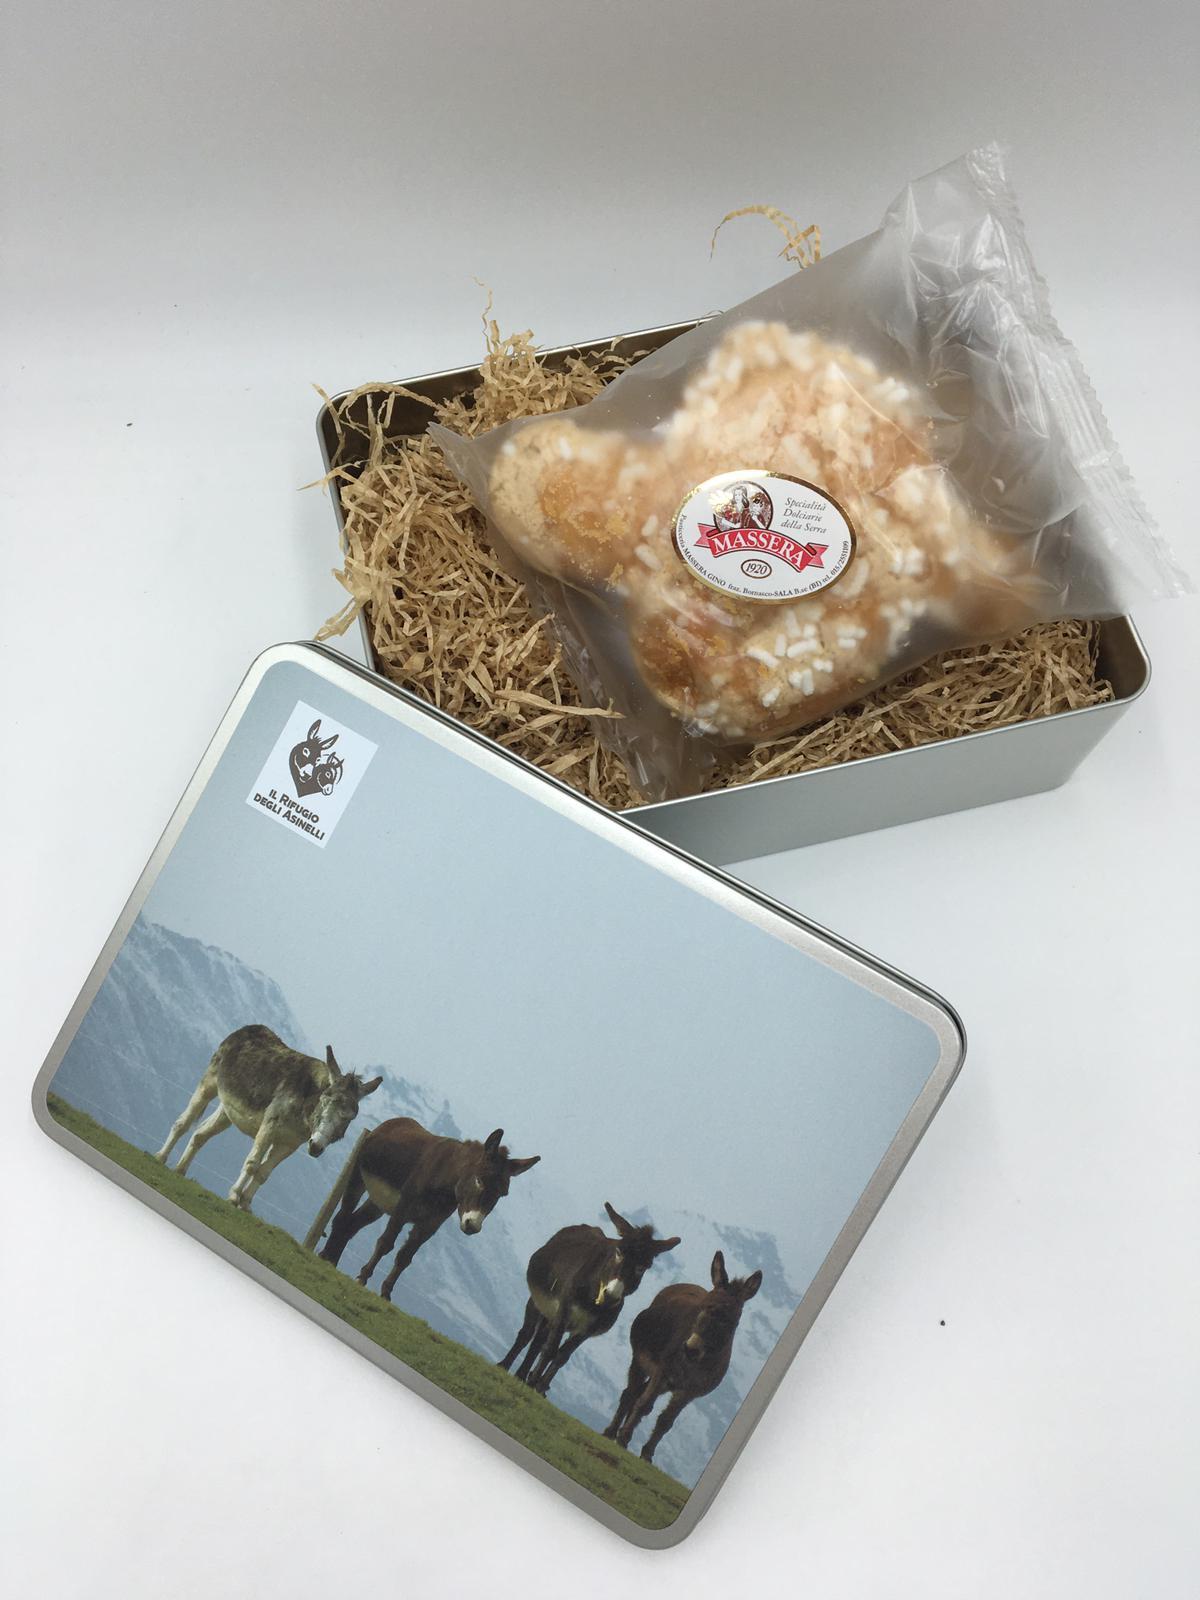 Easter cake (100 gr) and rectangular tin box with donkey image and logo Il Rifugio degli Asinelli. Size 22,1 x 16,2 x 6,7 cm